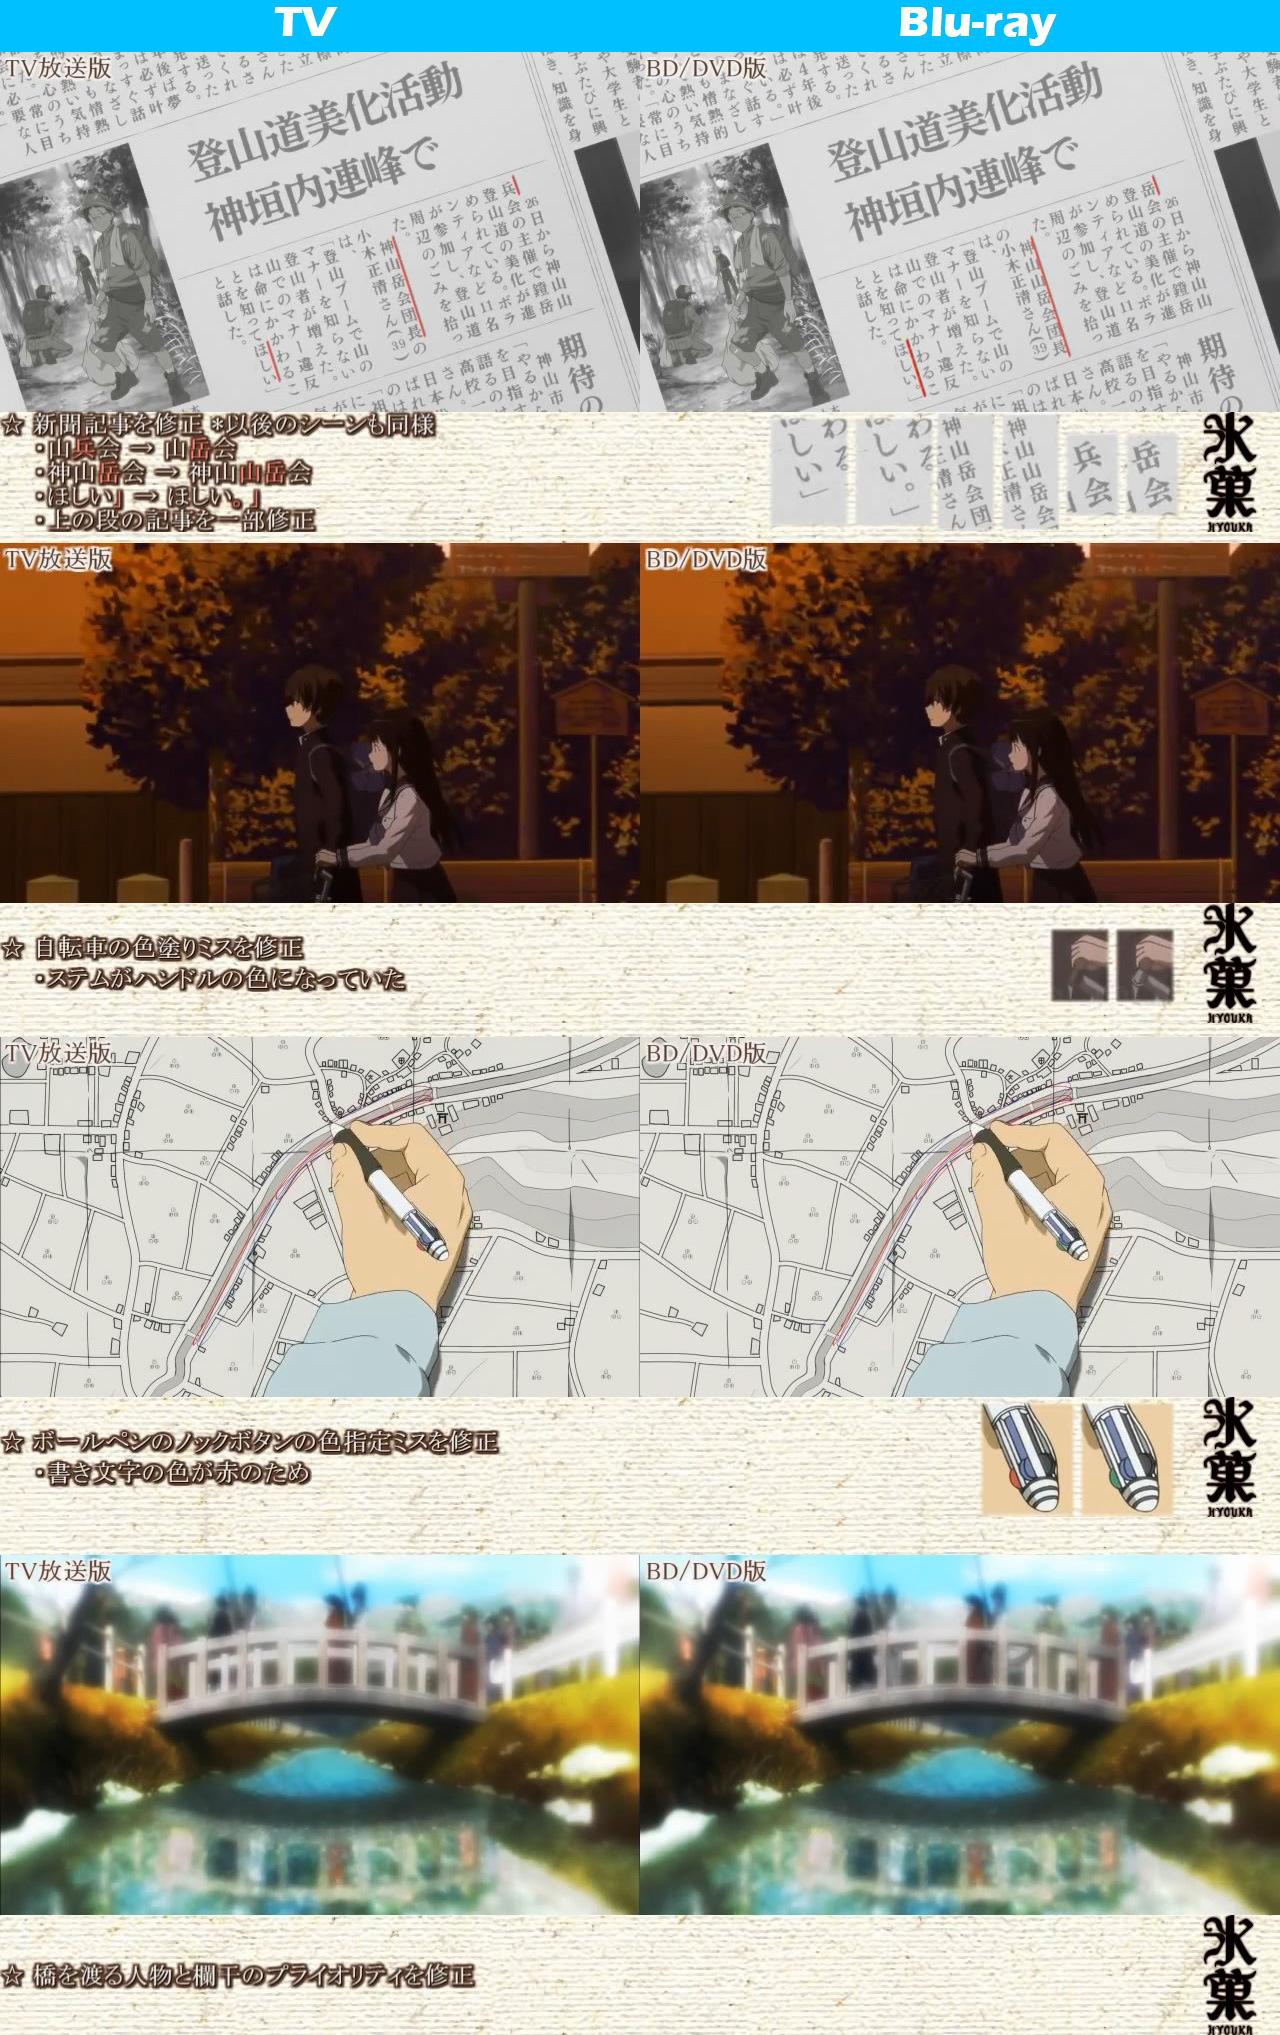 TV vs Blu-ray Comparison Hyouka anime 6